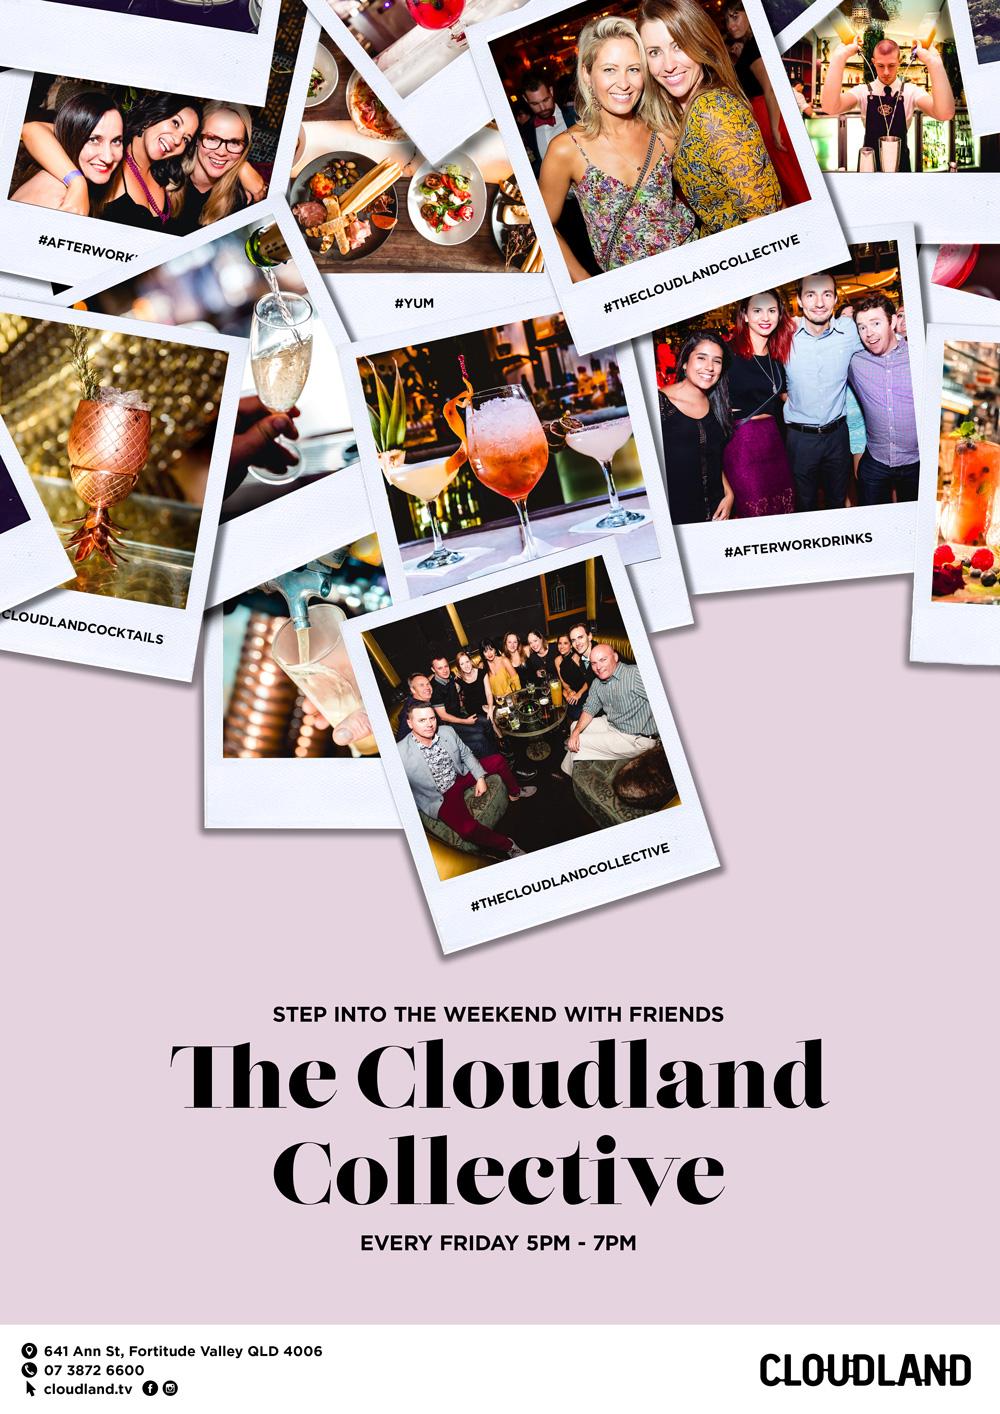 Cloudland Collective Friday